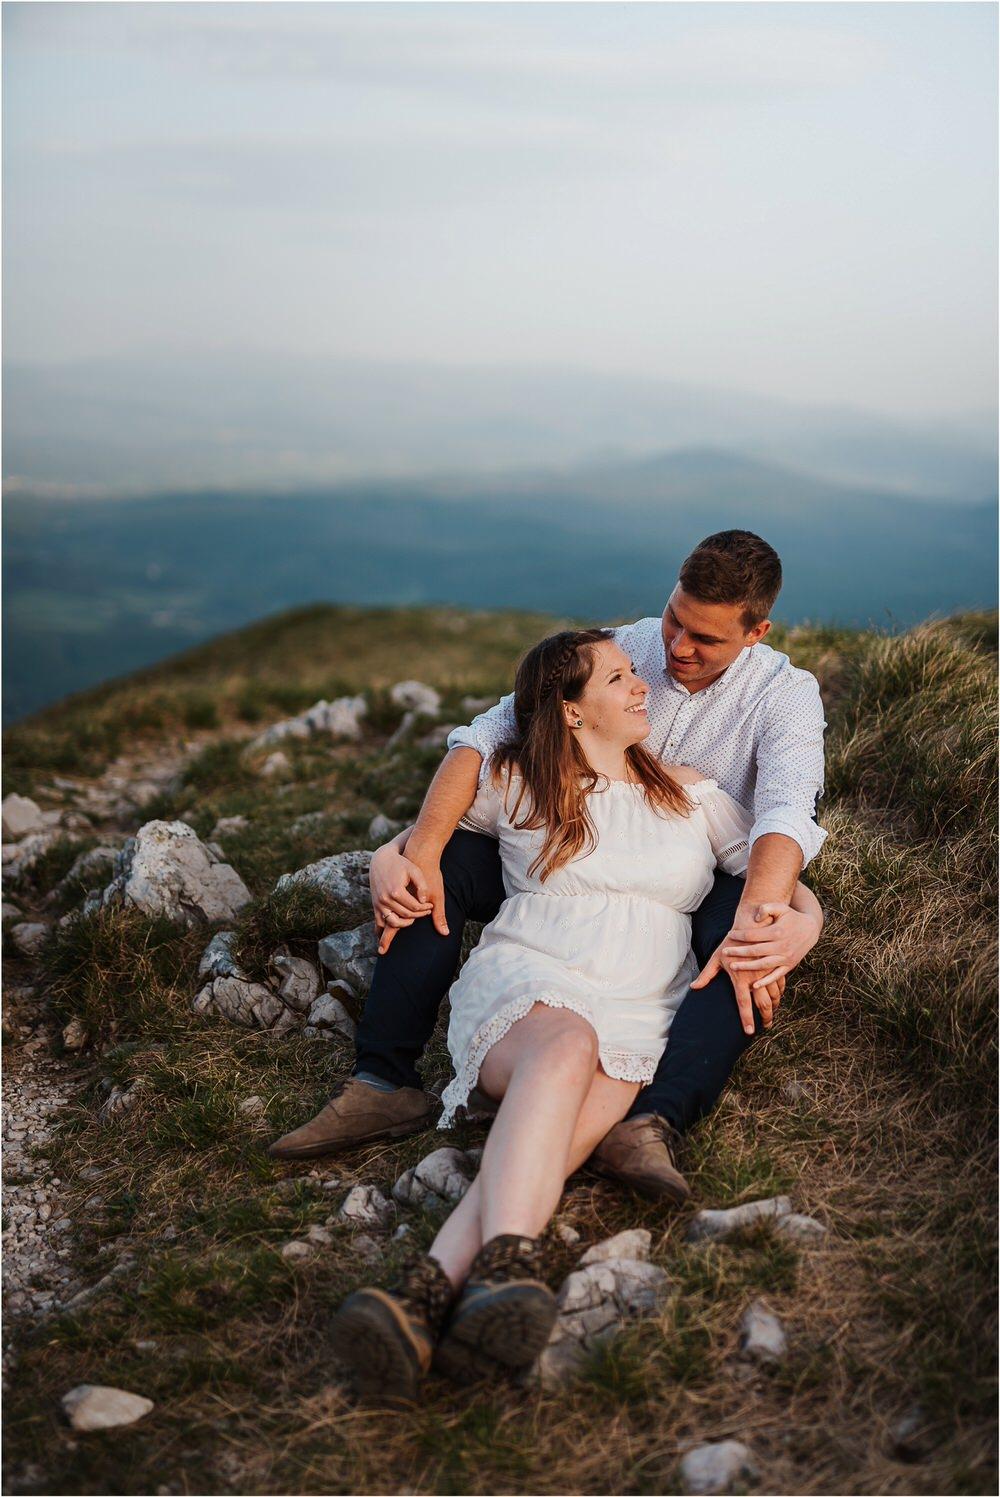 nanos slovenia mountain engagement poroka zaroka zarocno fotografiranje boho wedding chic nika grega slovenia slovenija 0034.jpg